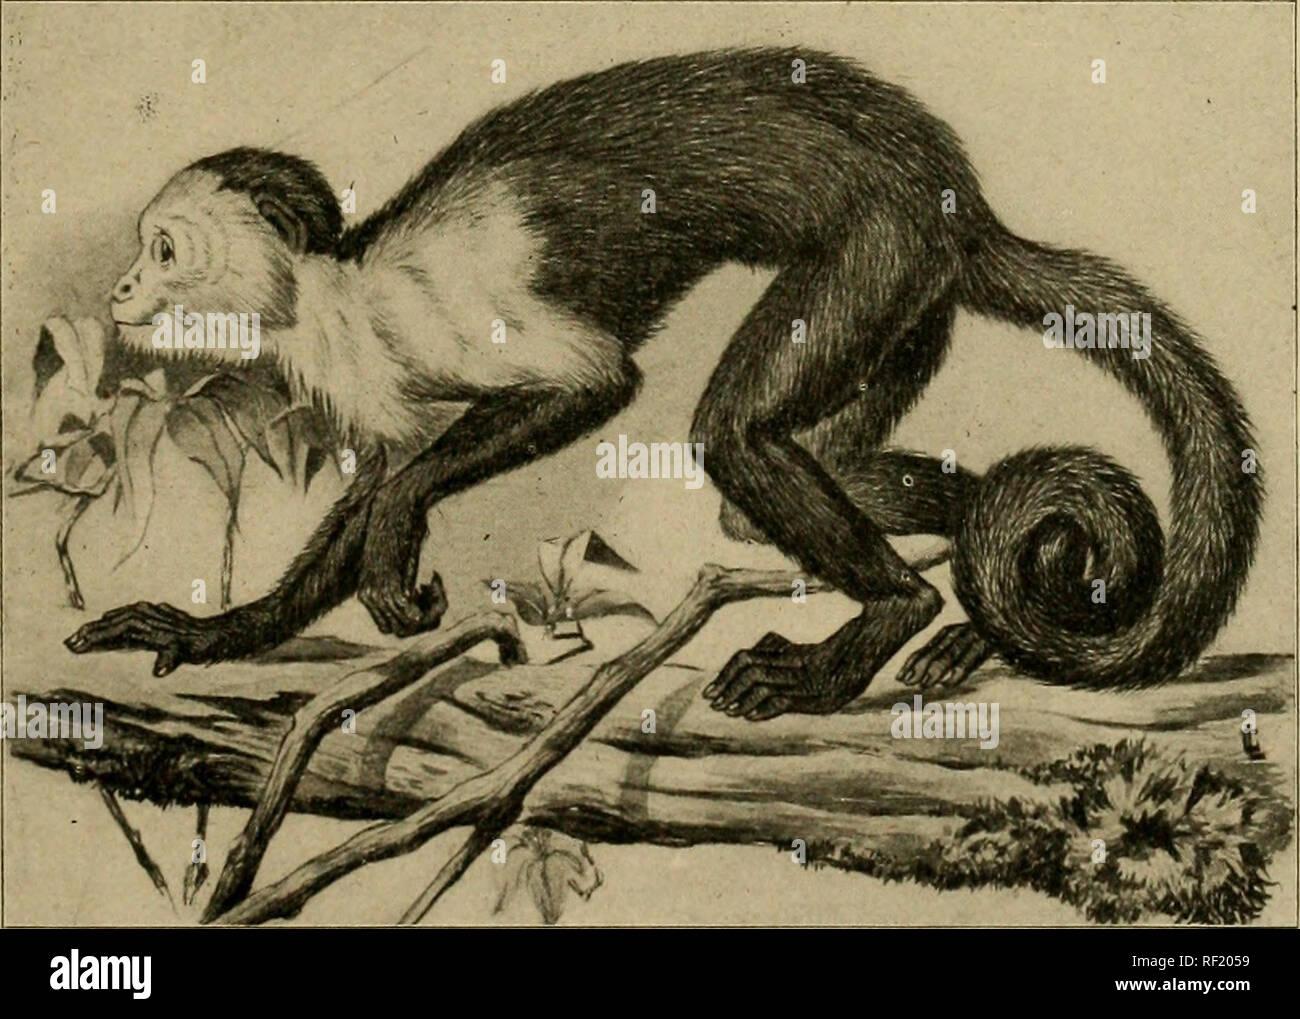 ". Un catálogo de la colección de mamíferos en el Museo Colombino Field. Museo Colombino Field; mamíferos. CEBUS. 561 Cebus pallidus gris, Cat. Monos, lemures &Amp; de comer fruta murciélagos Brit. Mus., 1870, pág. 49, nº 3. Pale capuchinos, 1-3. Adulto (J* P. Caicara, Venezuela. G. K. Cherrie, 4. Juv. 6^ P. Caicara, Venezuela. G. K. Cherrie. 5. Adulto 9 p. de Caicara, Venezuela. G. K. Cherrie, 6. Adulto ? P. Alta Gracia, ""Río Oronoco, Venezuela. G. K. Cherrie. 984. Cebus capucinus (Linnaeus). Simia capiichia Linn., Syst. Nat., i, 1758, pág. 19; i, 1766, pág. 42. Cebus nigrivittatus KhhdindX Wsign.,. Akad. Miinche Foto de stock"